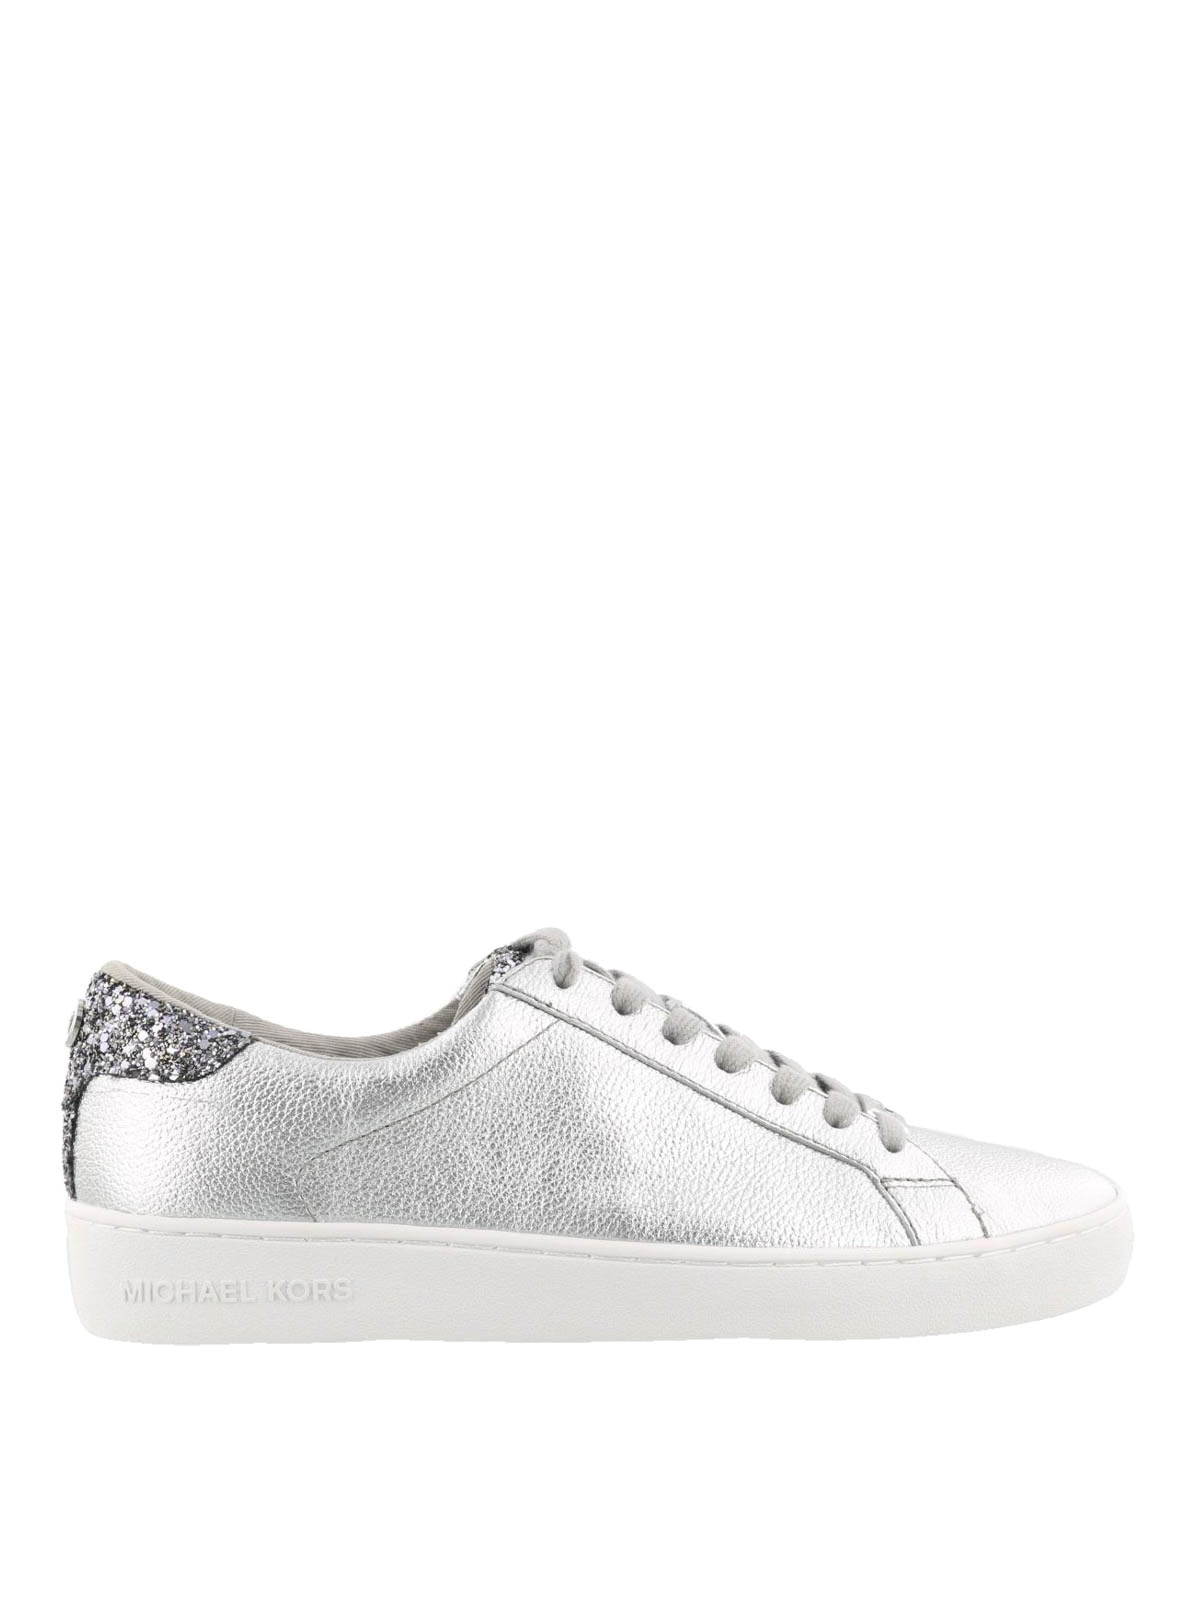 ca03a050939a3 Michael Kors - Sneaker - Silber - Sneaker - 43R8IRFS1M040